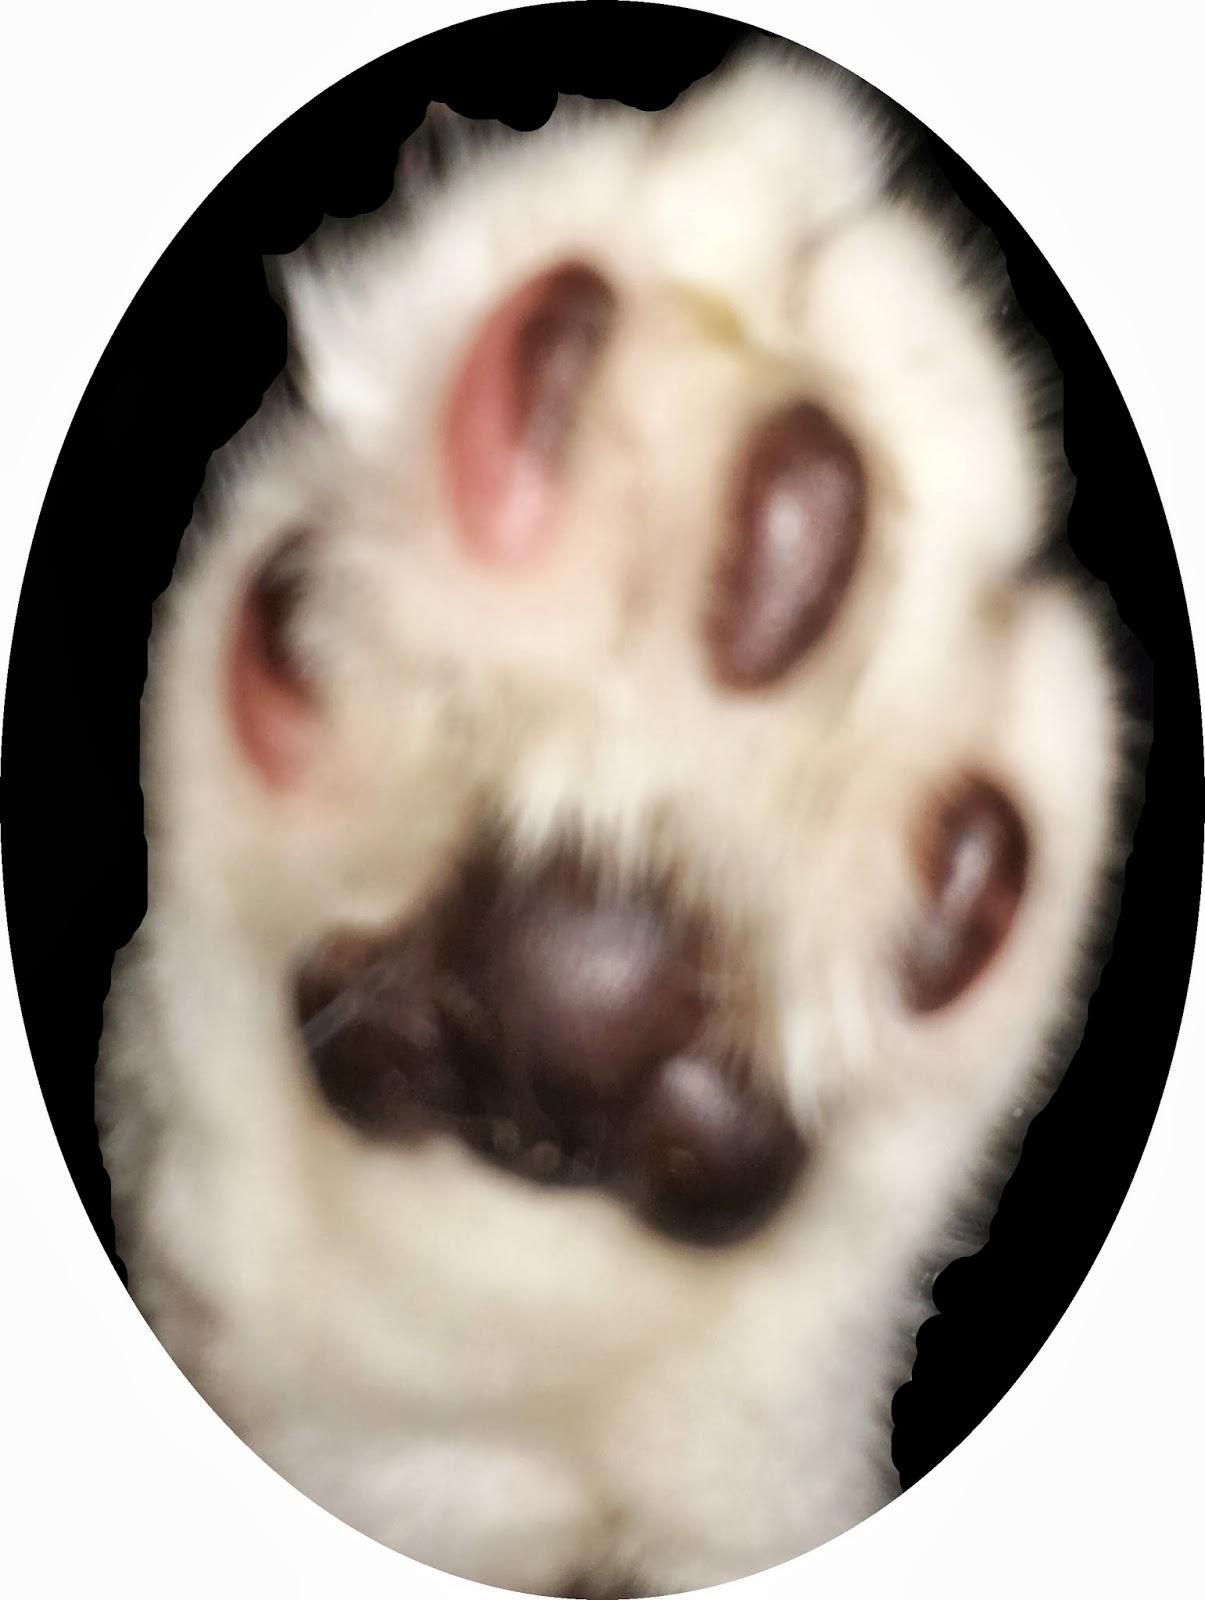 Image: Mr Bumpy's paw.